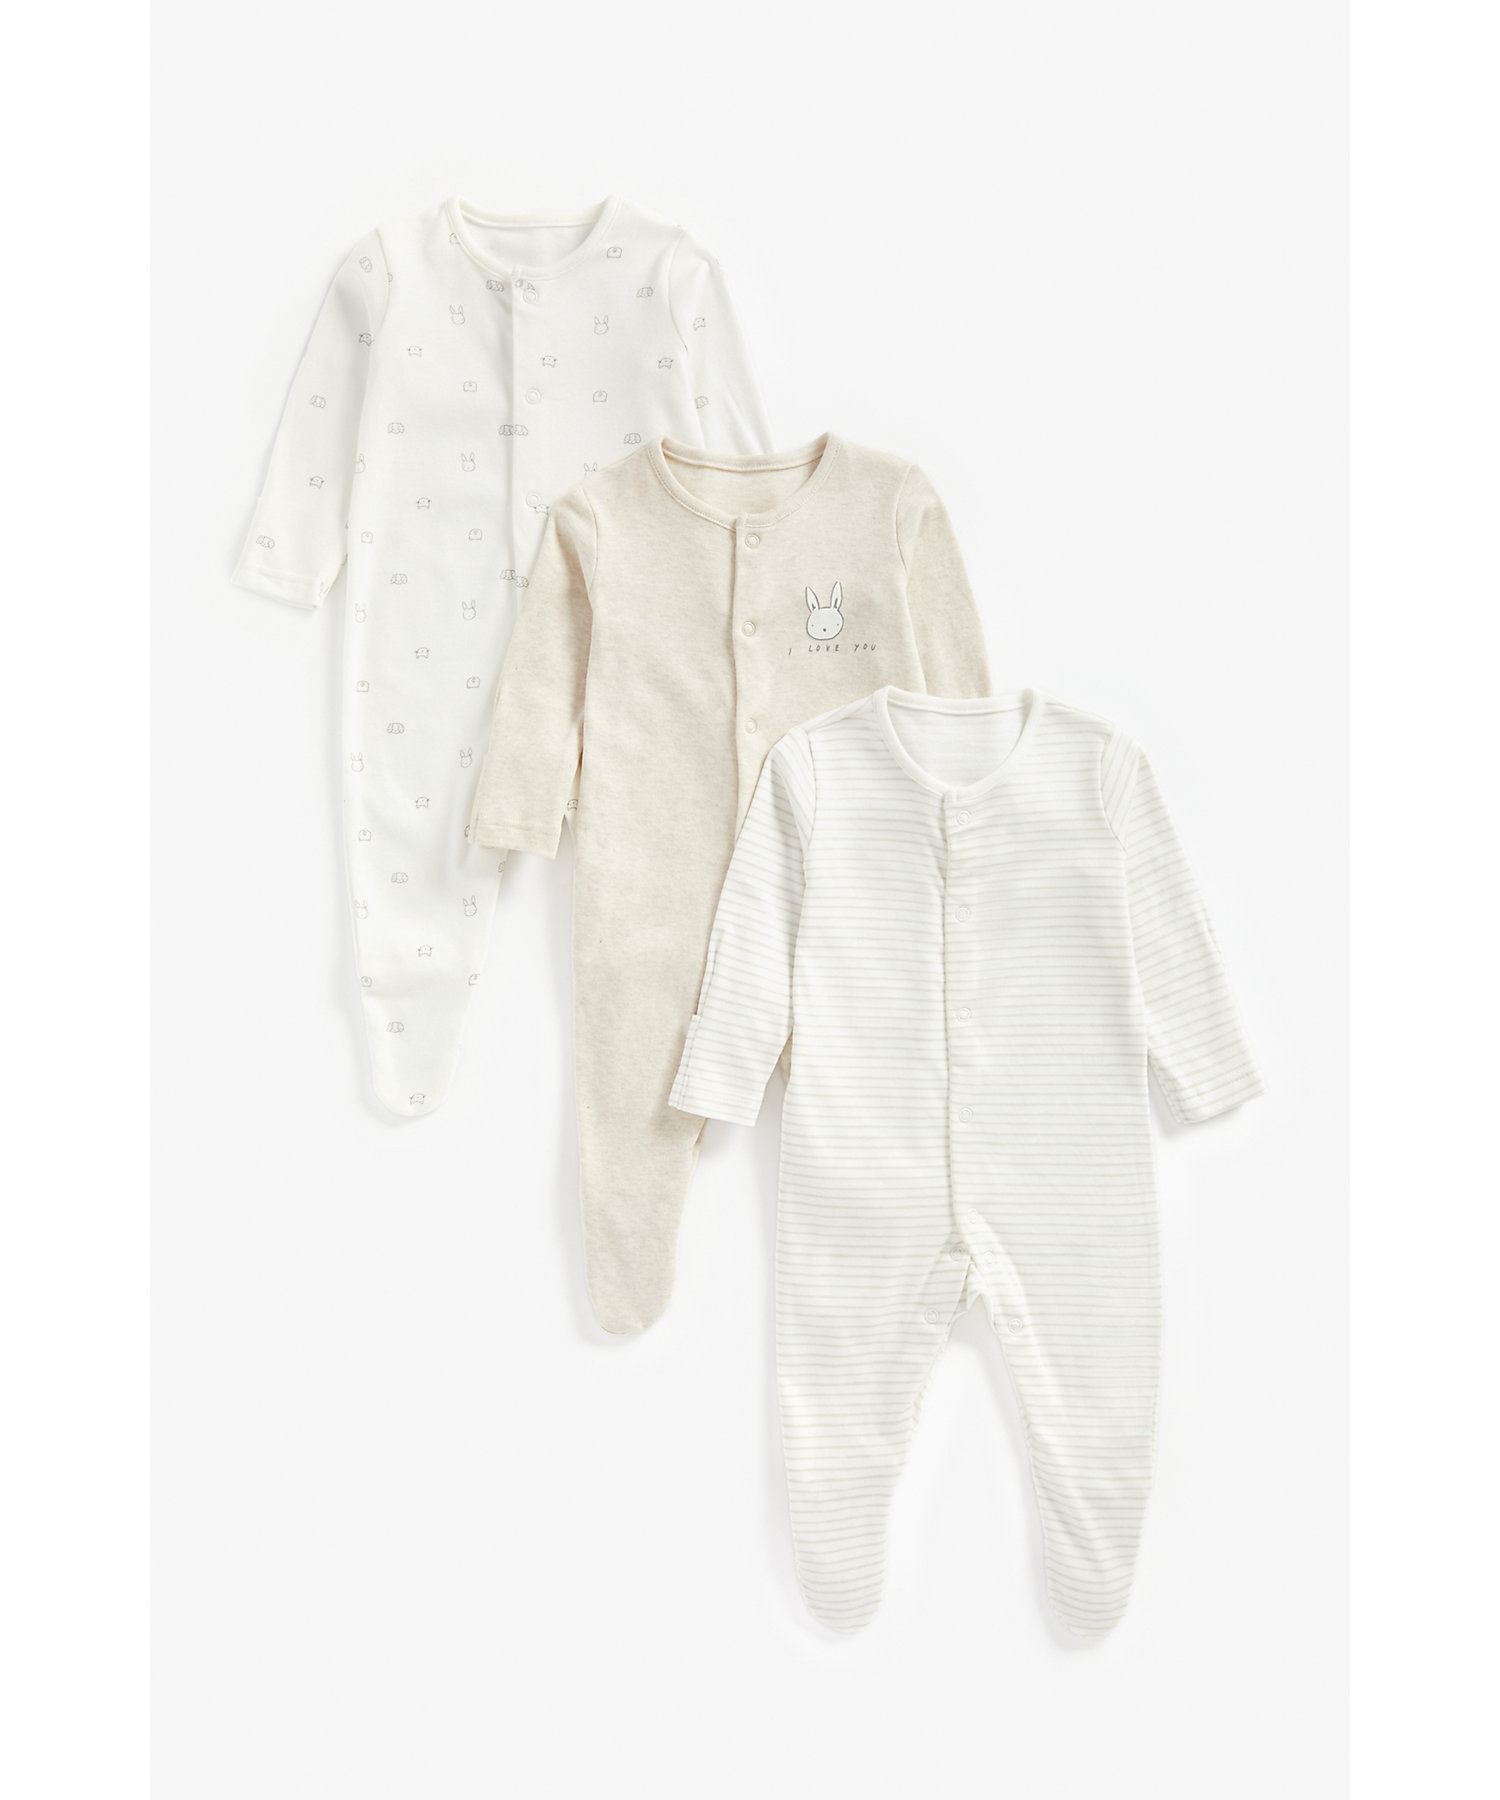 Mothercare   Unisex Full Sleeves Sleepsuit Bunny Print - Pack Of 3 - Beige